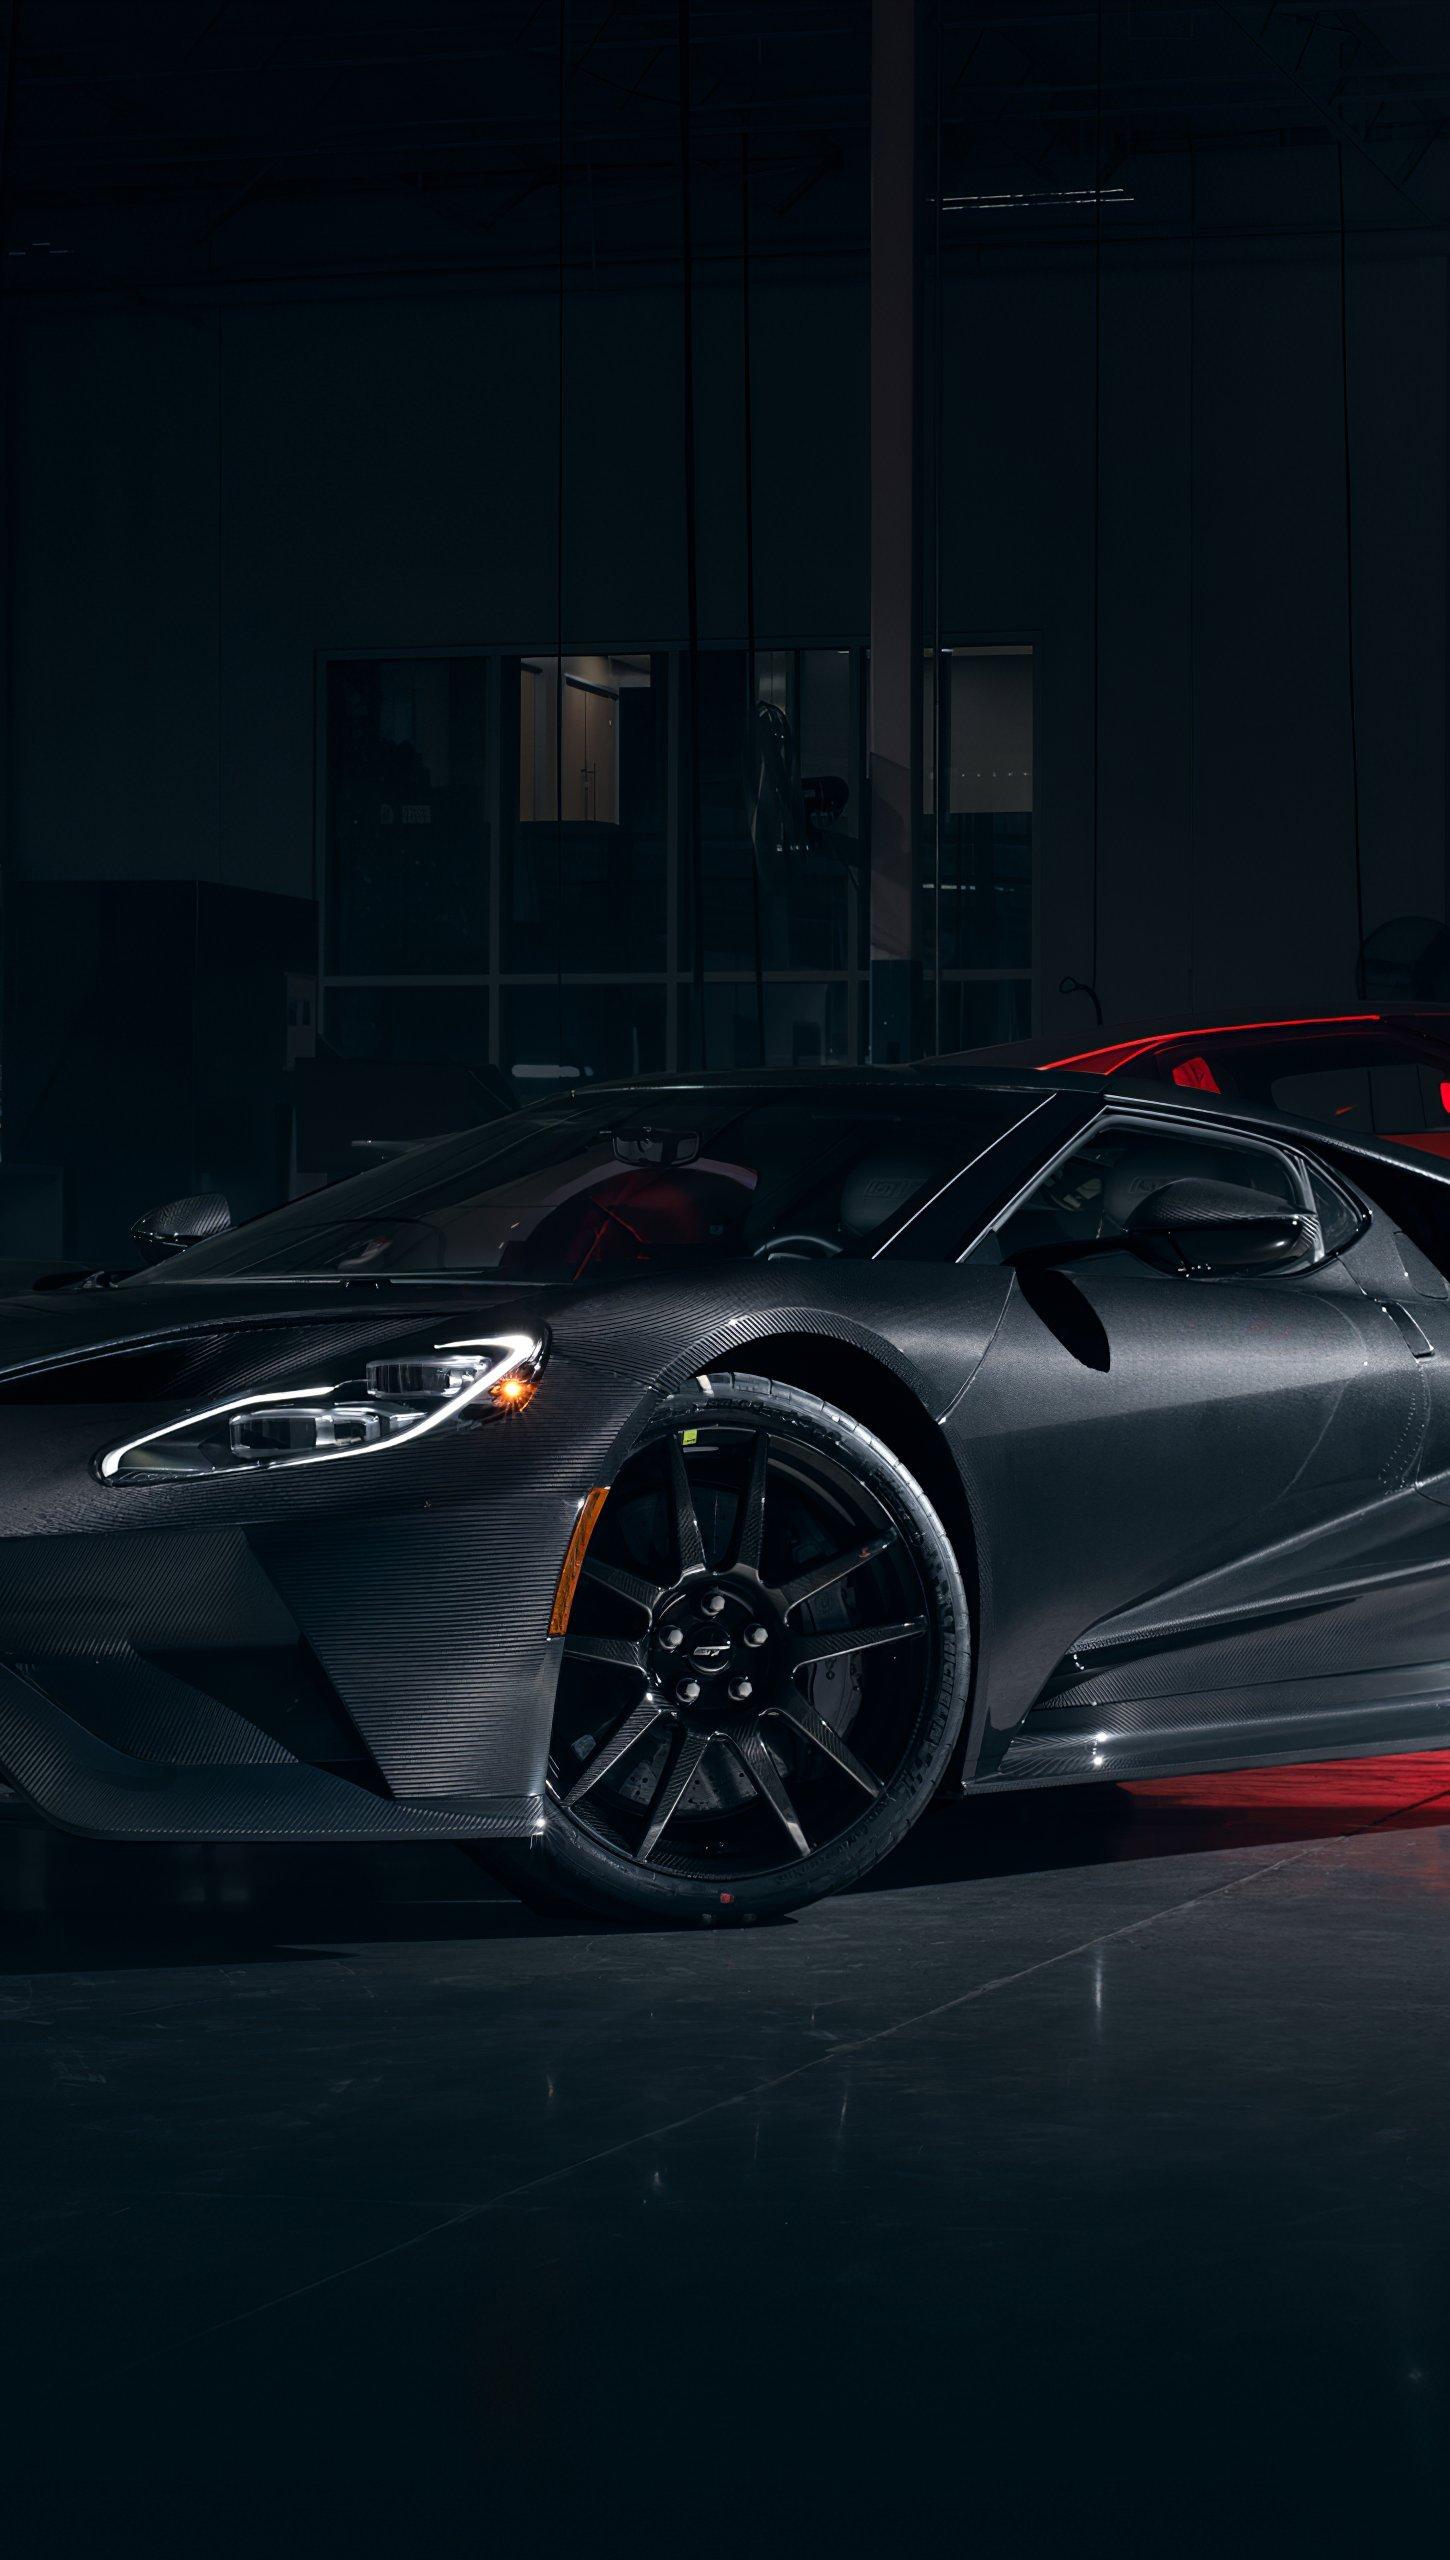 Fondos de pantalla Ford GT 2020 Vertical